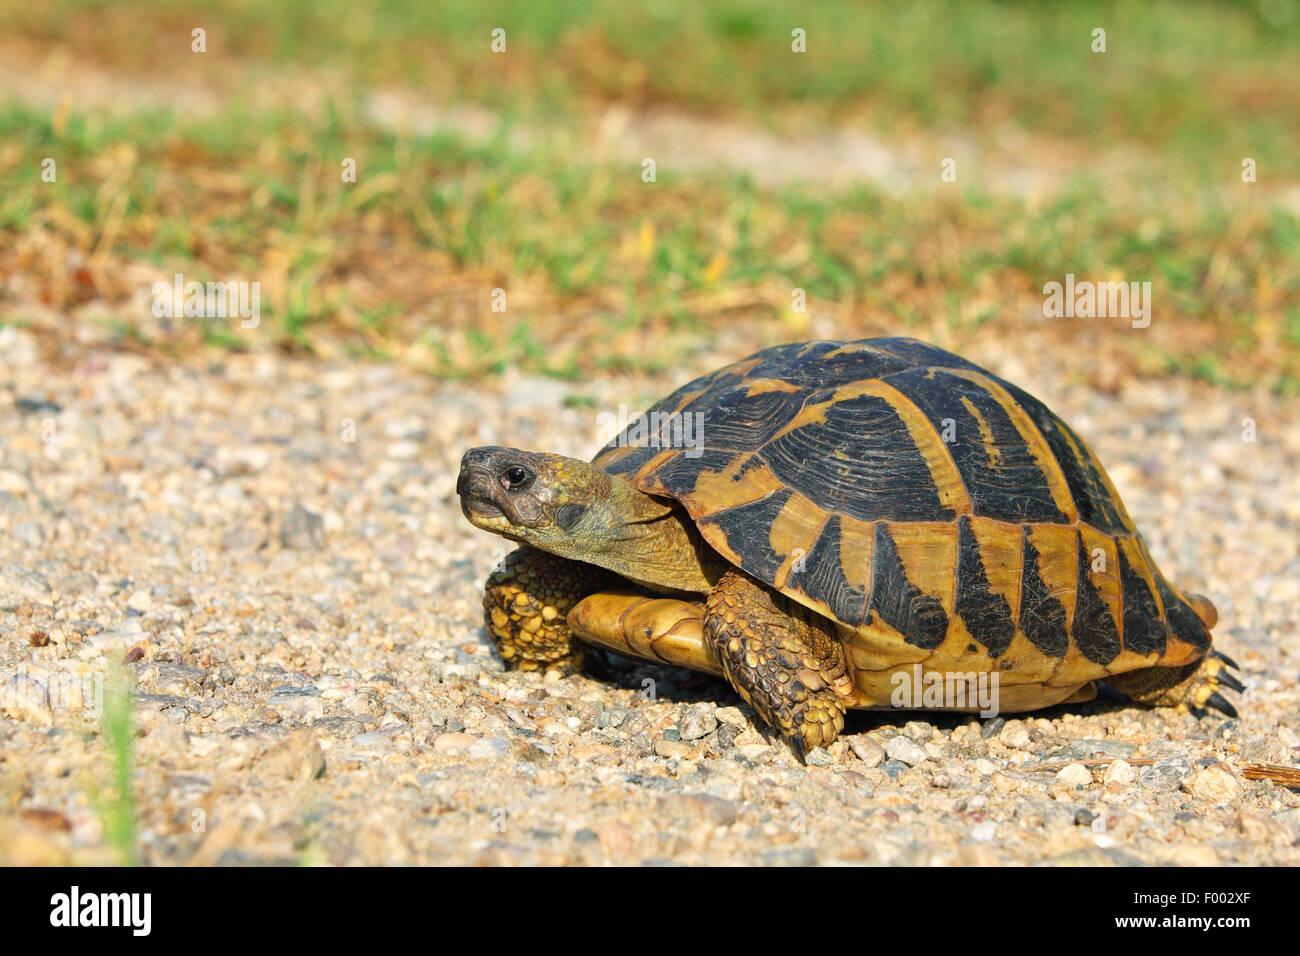 Hermann's tortoise, Greek tortoise (Testudo hermanni), walking tortoise, Greece, Lake Kerkini Stock Photo